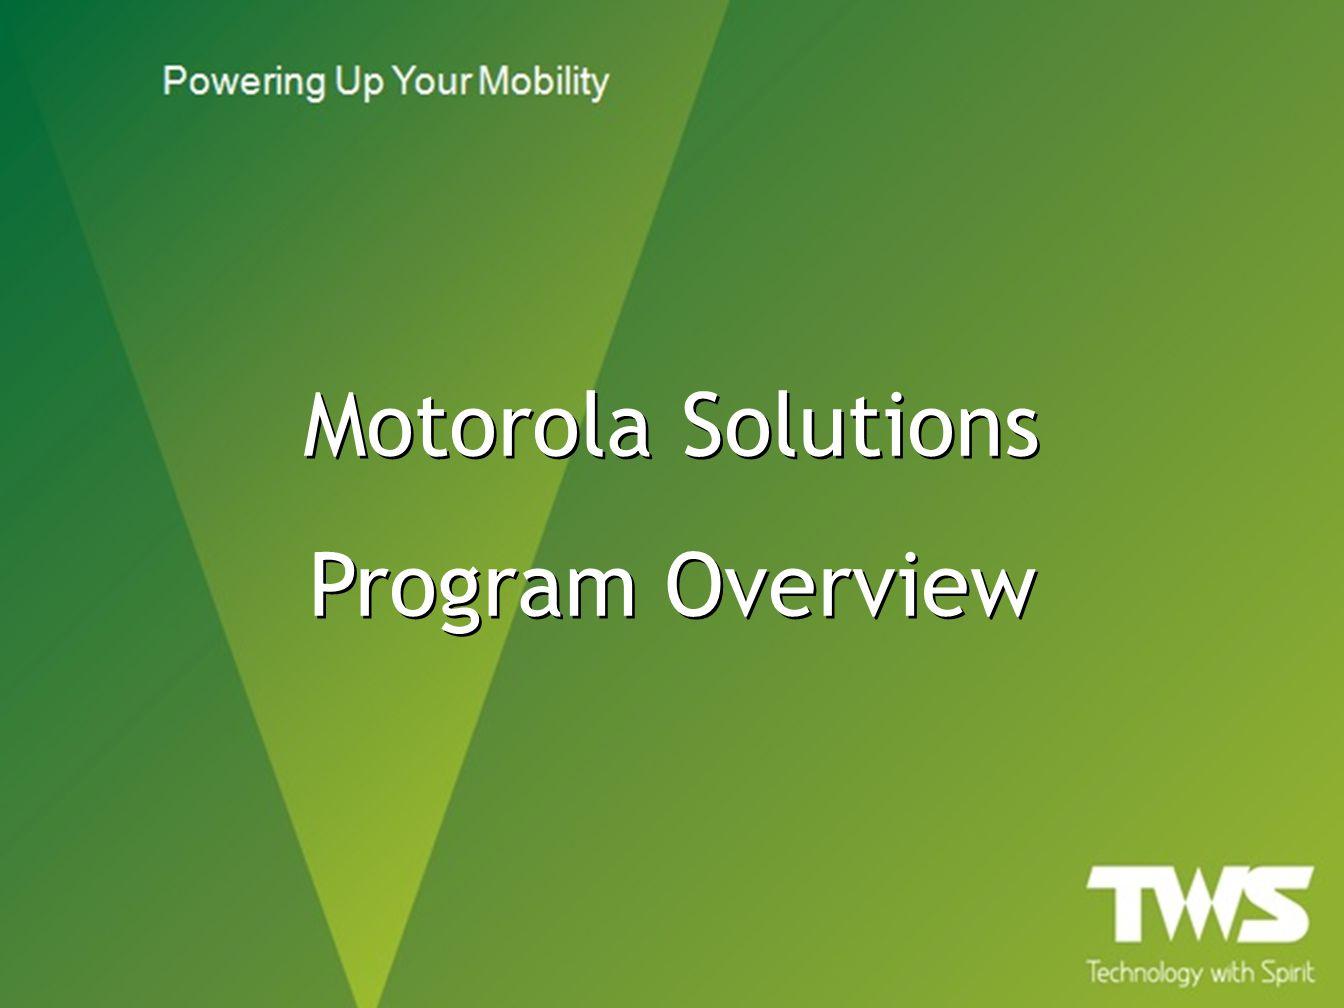 Motorola Solutions Program Overview